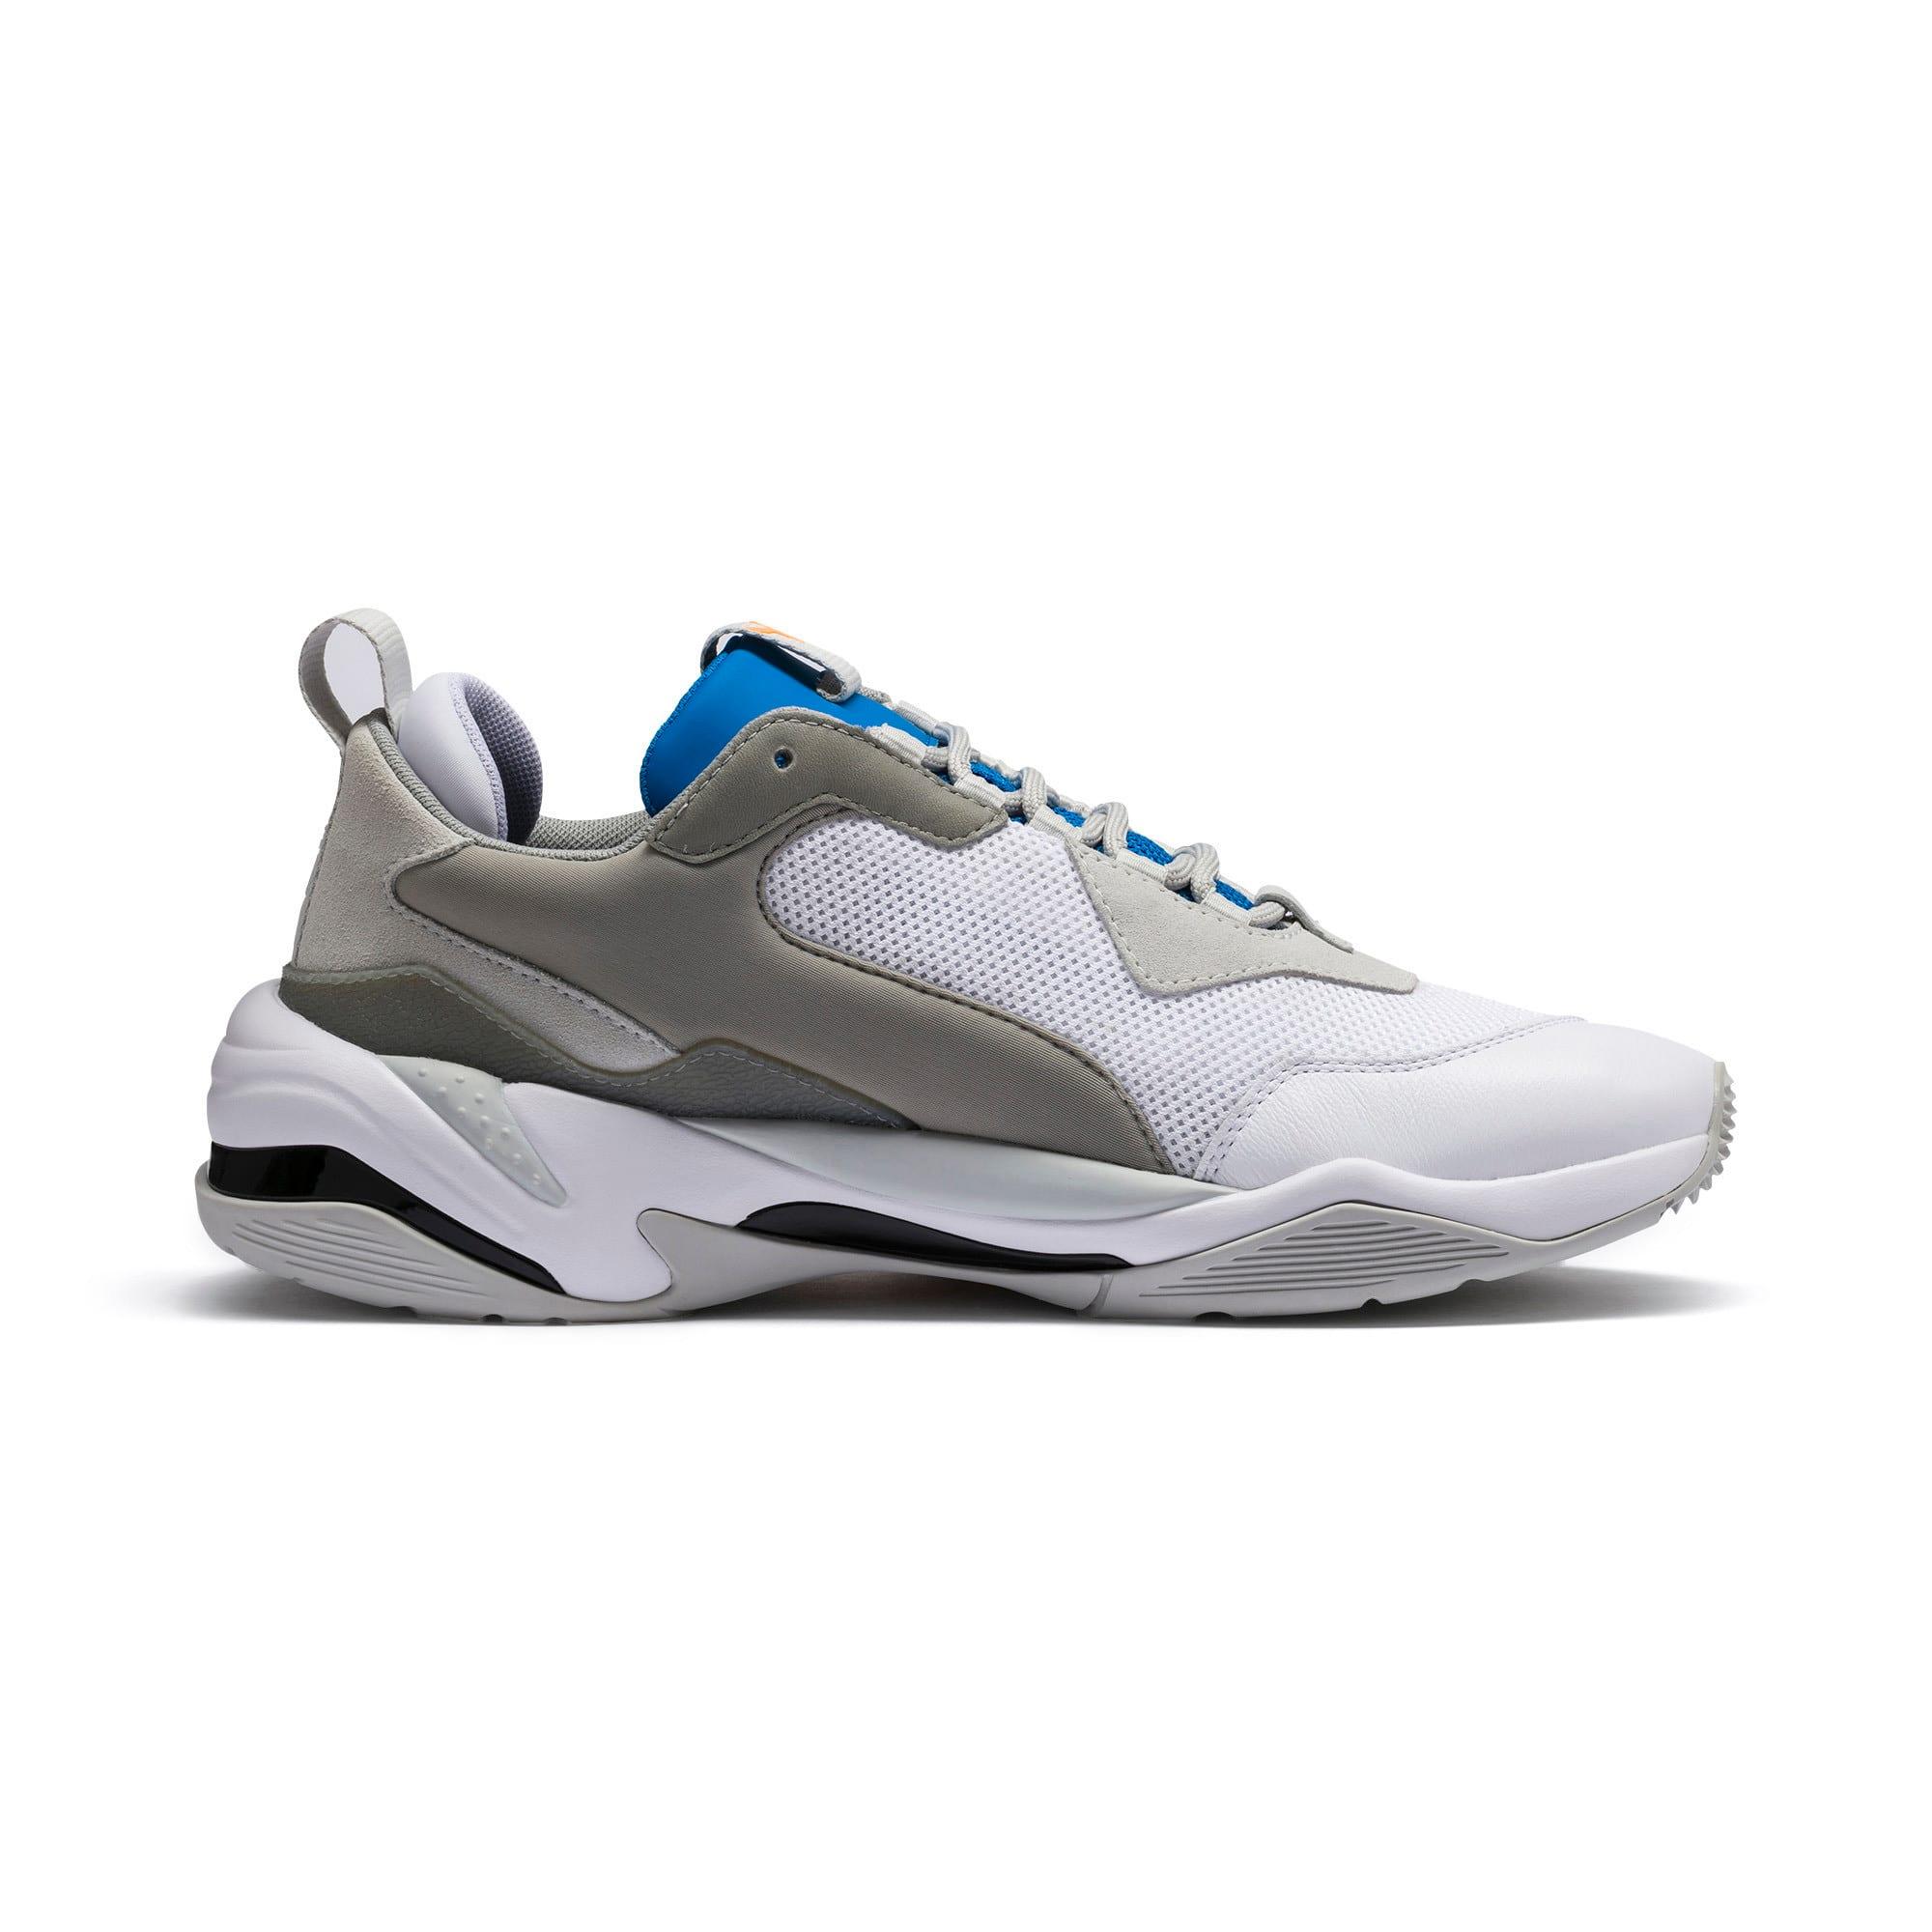 Thumbnail 5 of Sneakers Thunder Spectra, Glacier Gray-Indigo Bunting, medium